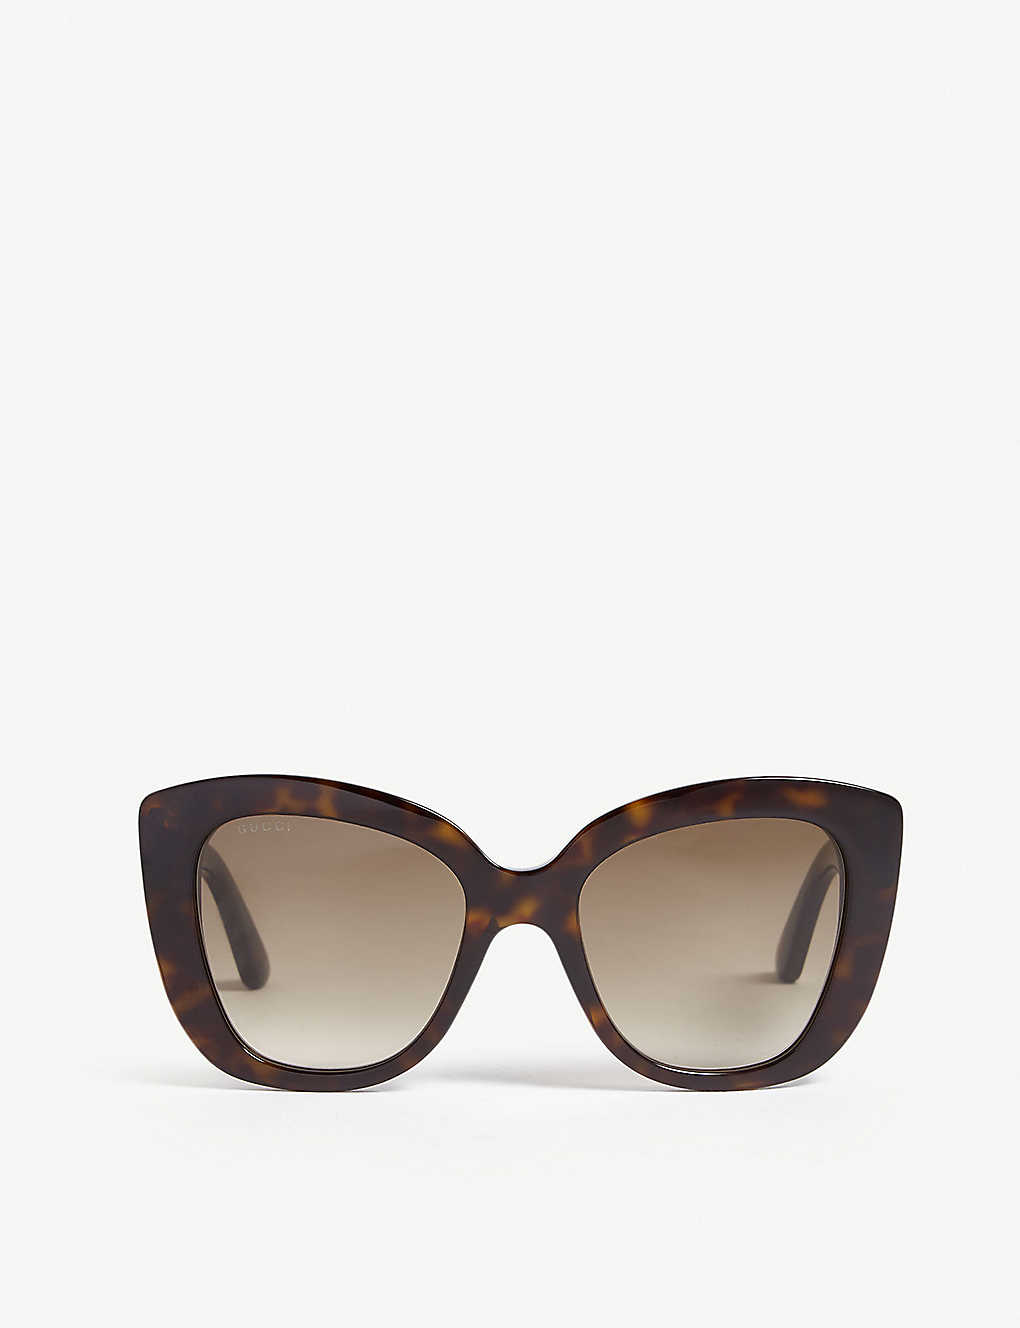 aad0ee4707b7b GUCCI - Havana Gg0327s cat-eye frame sunglasses